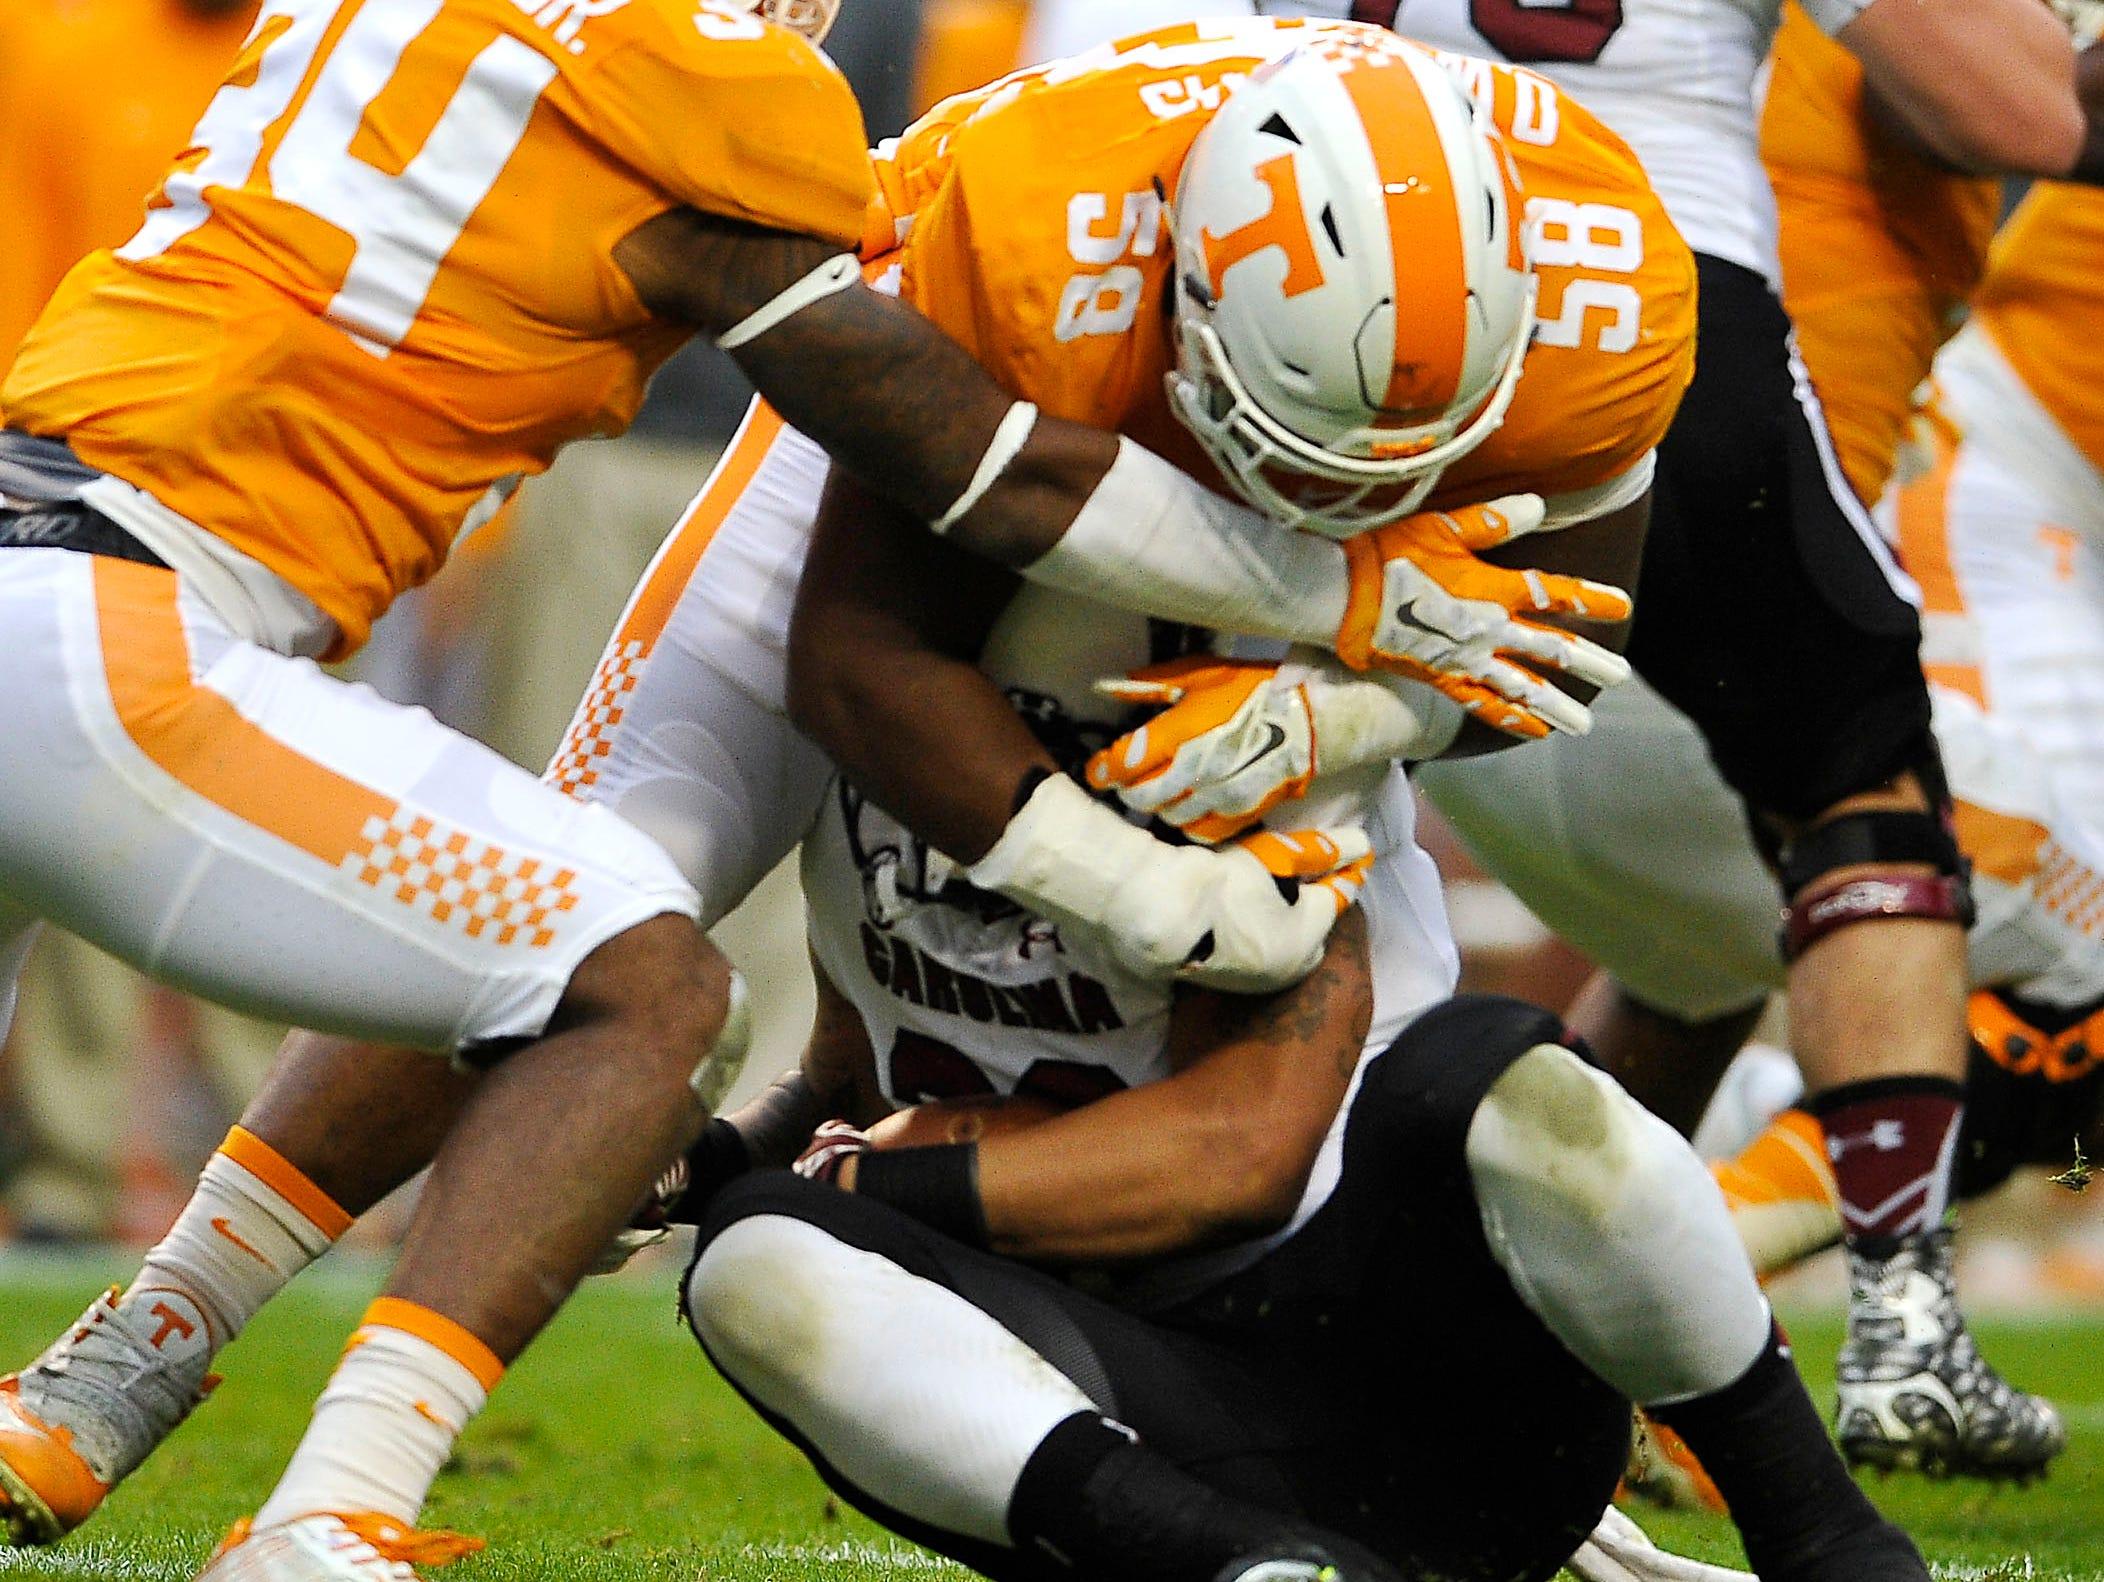 Tennessee defensive lineman Owen Williams (58) and linebacker Darrin Kirkland Jr. (34) cover up South Carolina running back Brandon Wilds (22) on Nov. 7, 2015.